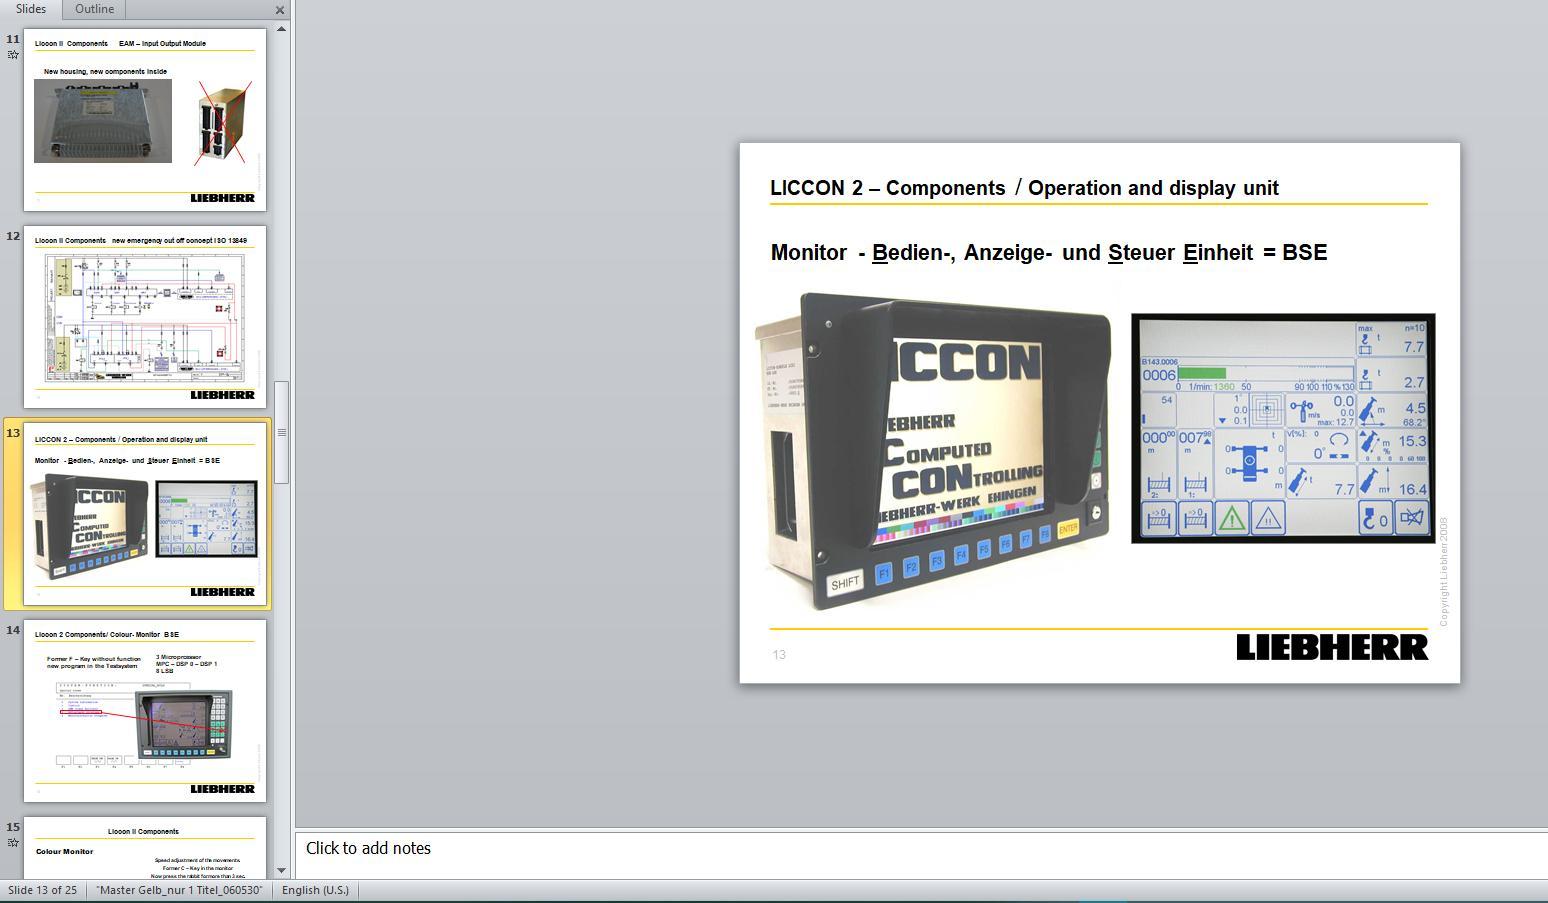 Liebherr Crane LICCON Error Codes Manual CD1